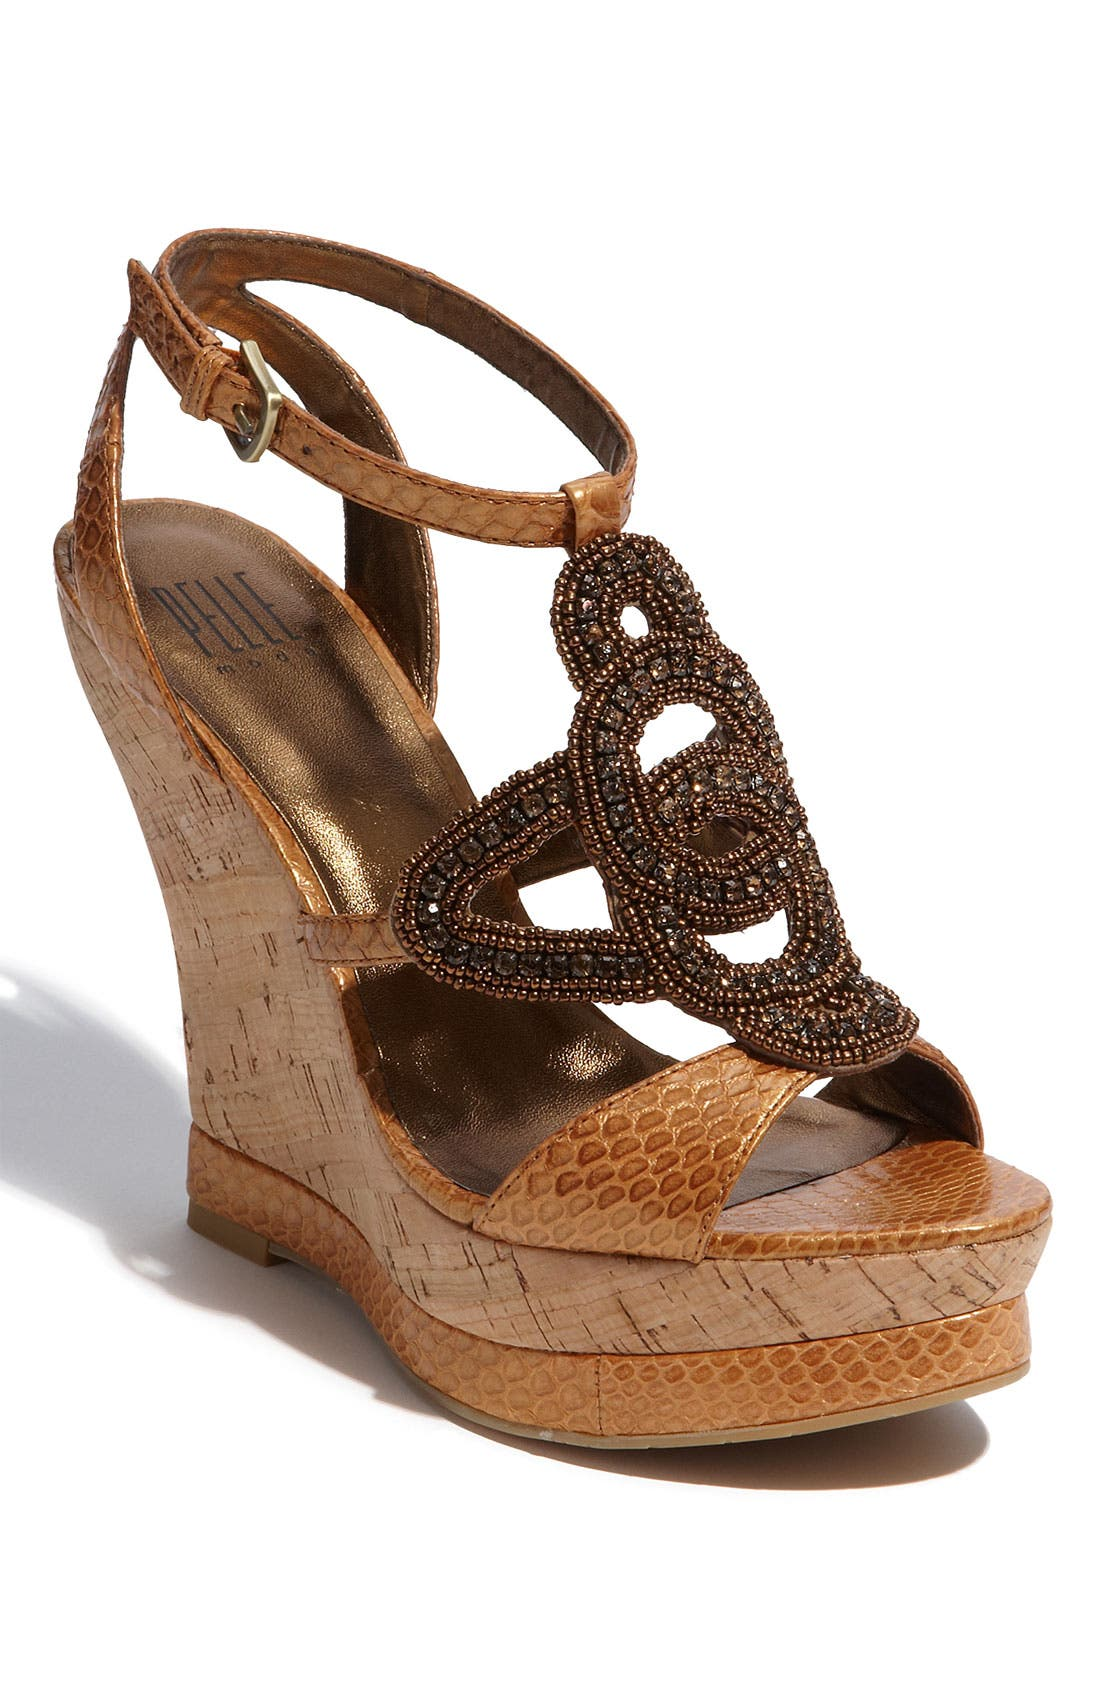 Main Image - Pelle Moda 'Niland' Wedge Sandal